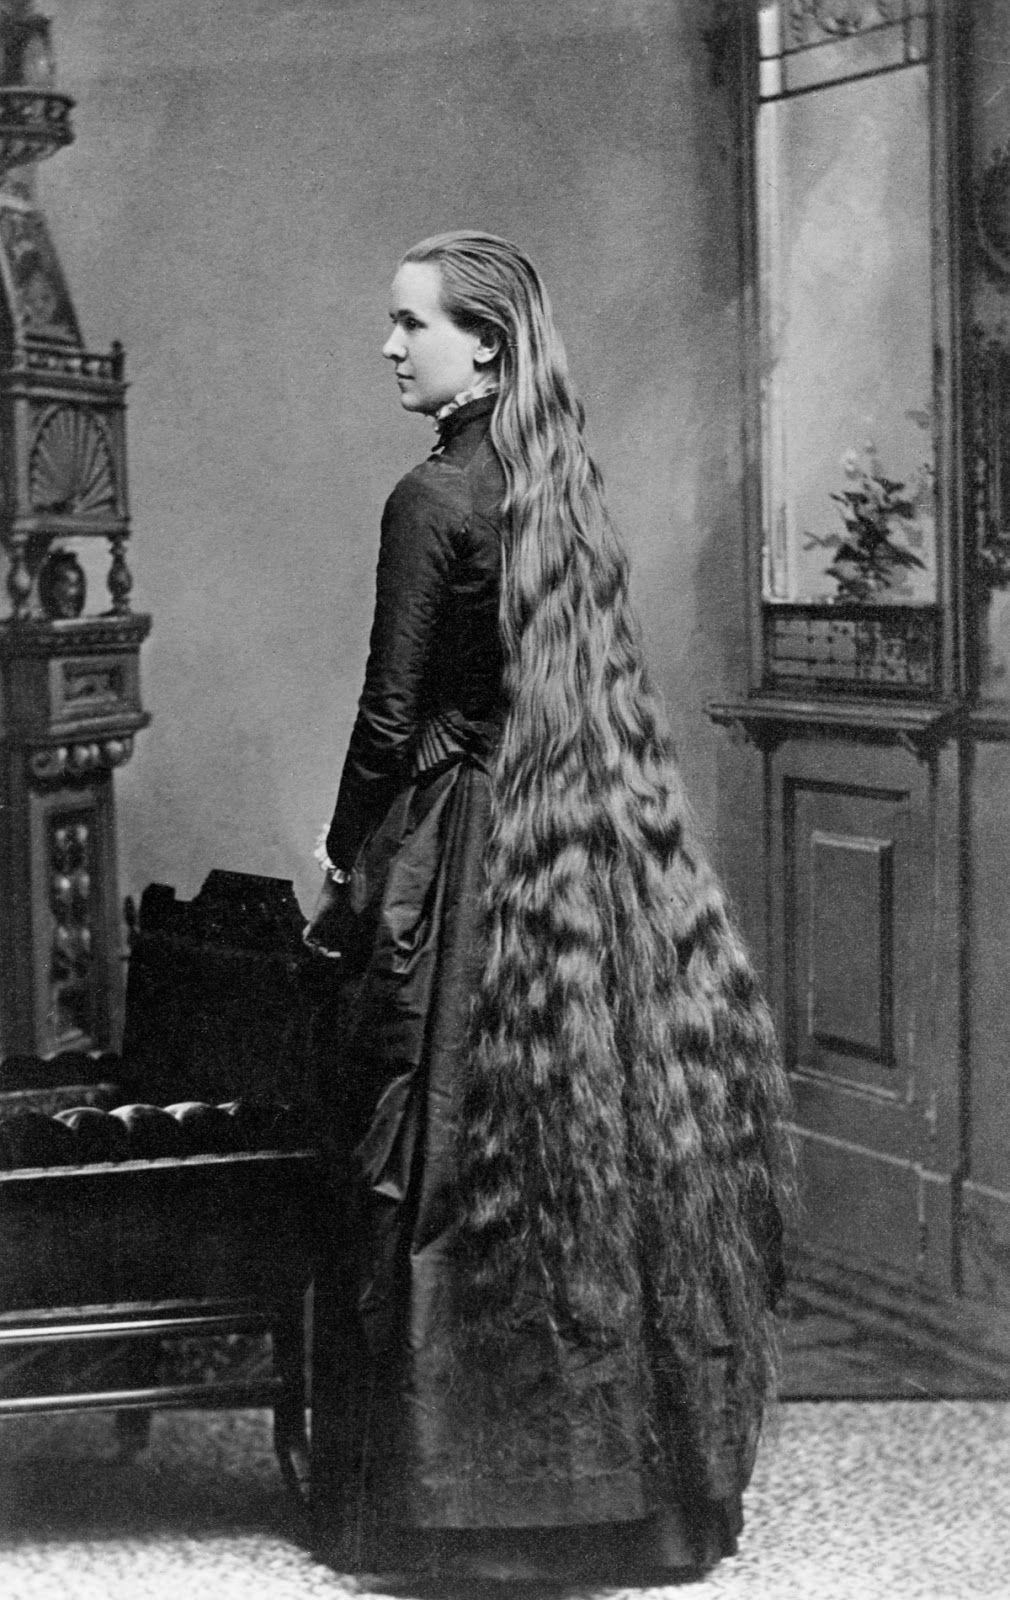 Vintage Everyday Long Hair Victorian Style 14 Vintage